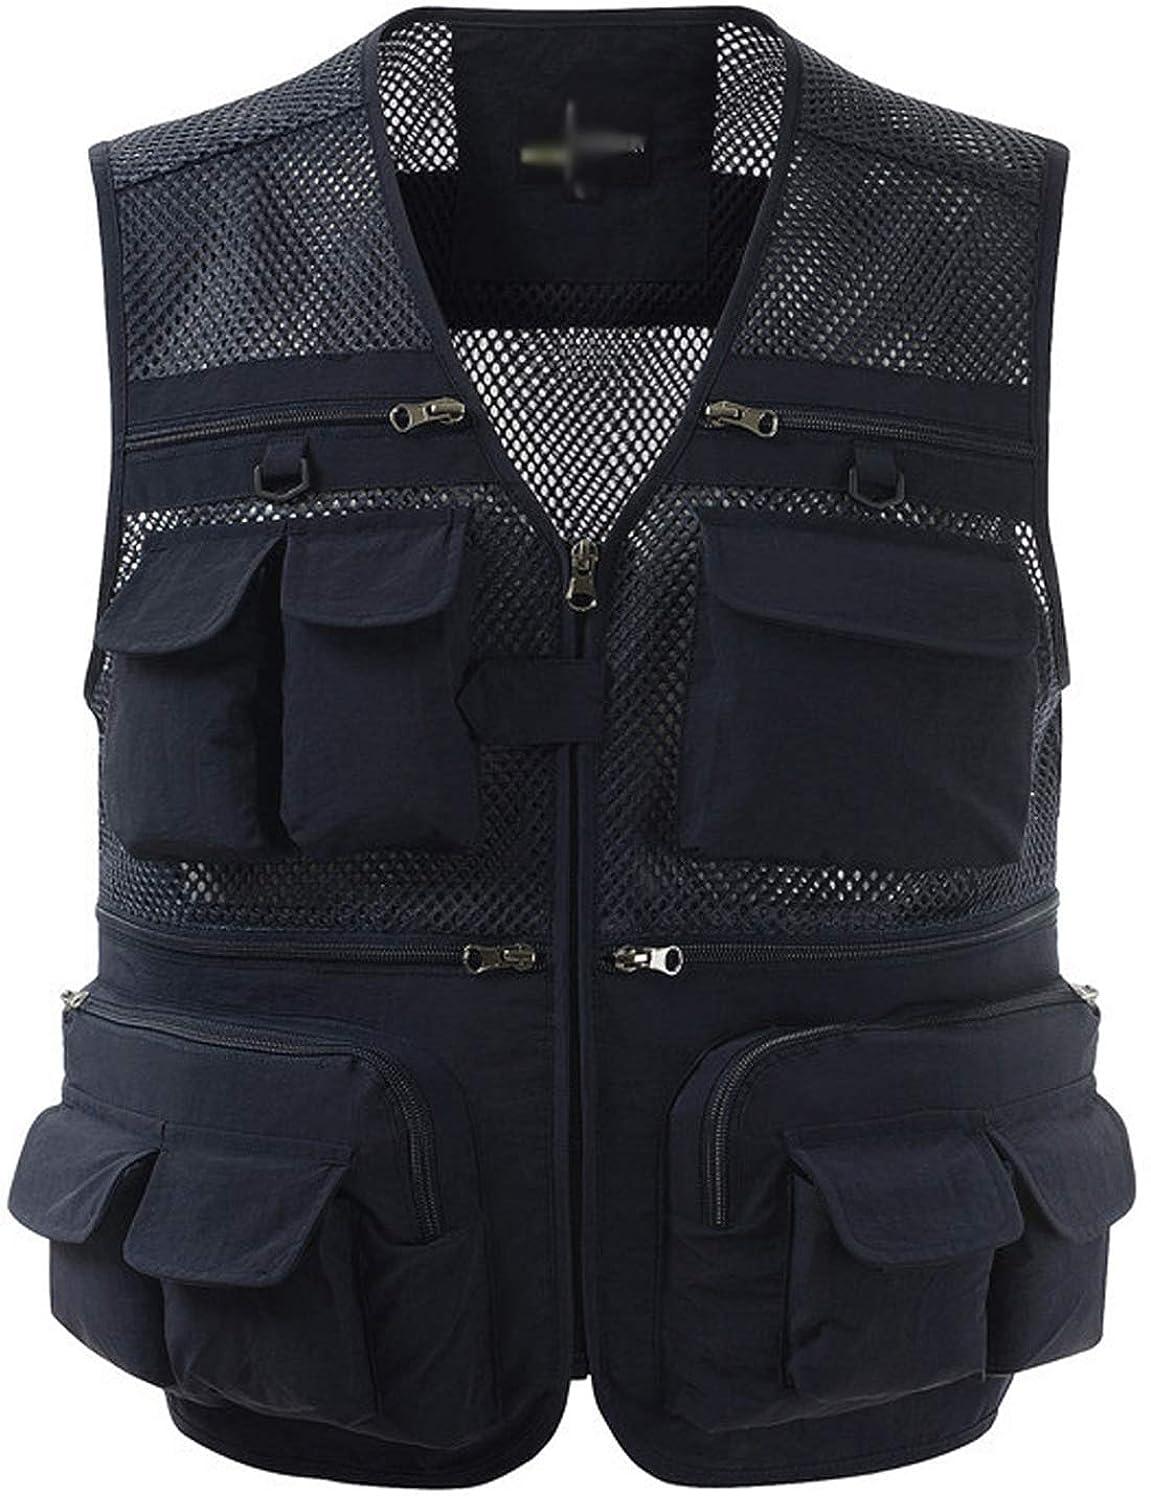 Zhusheng Mens Mesh Outdoor Work Fishing Travel Photo Vest with 16 Pockets Khaki